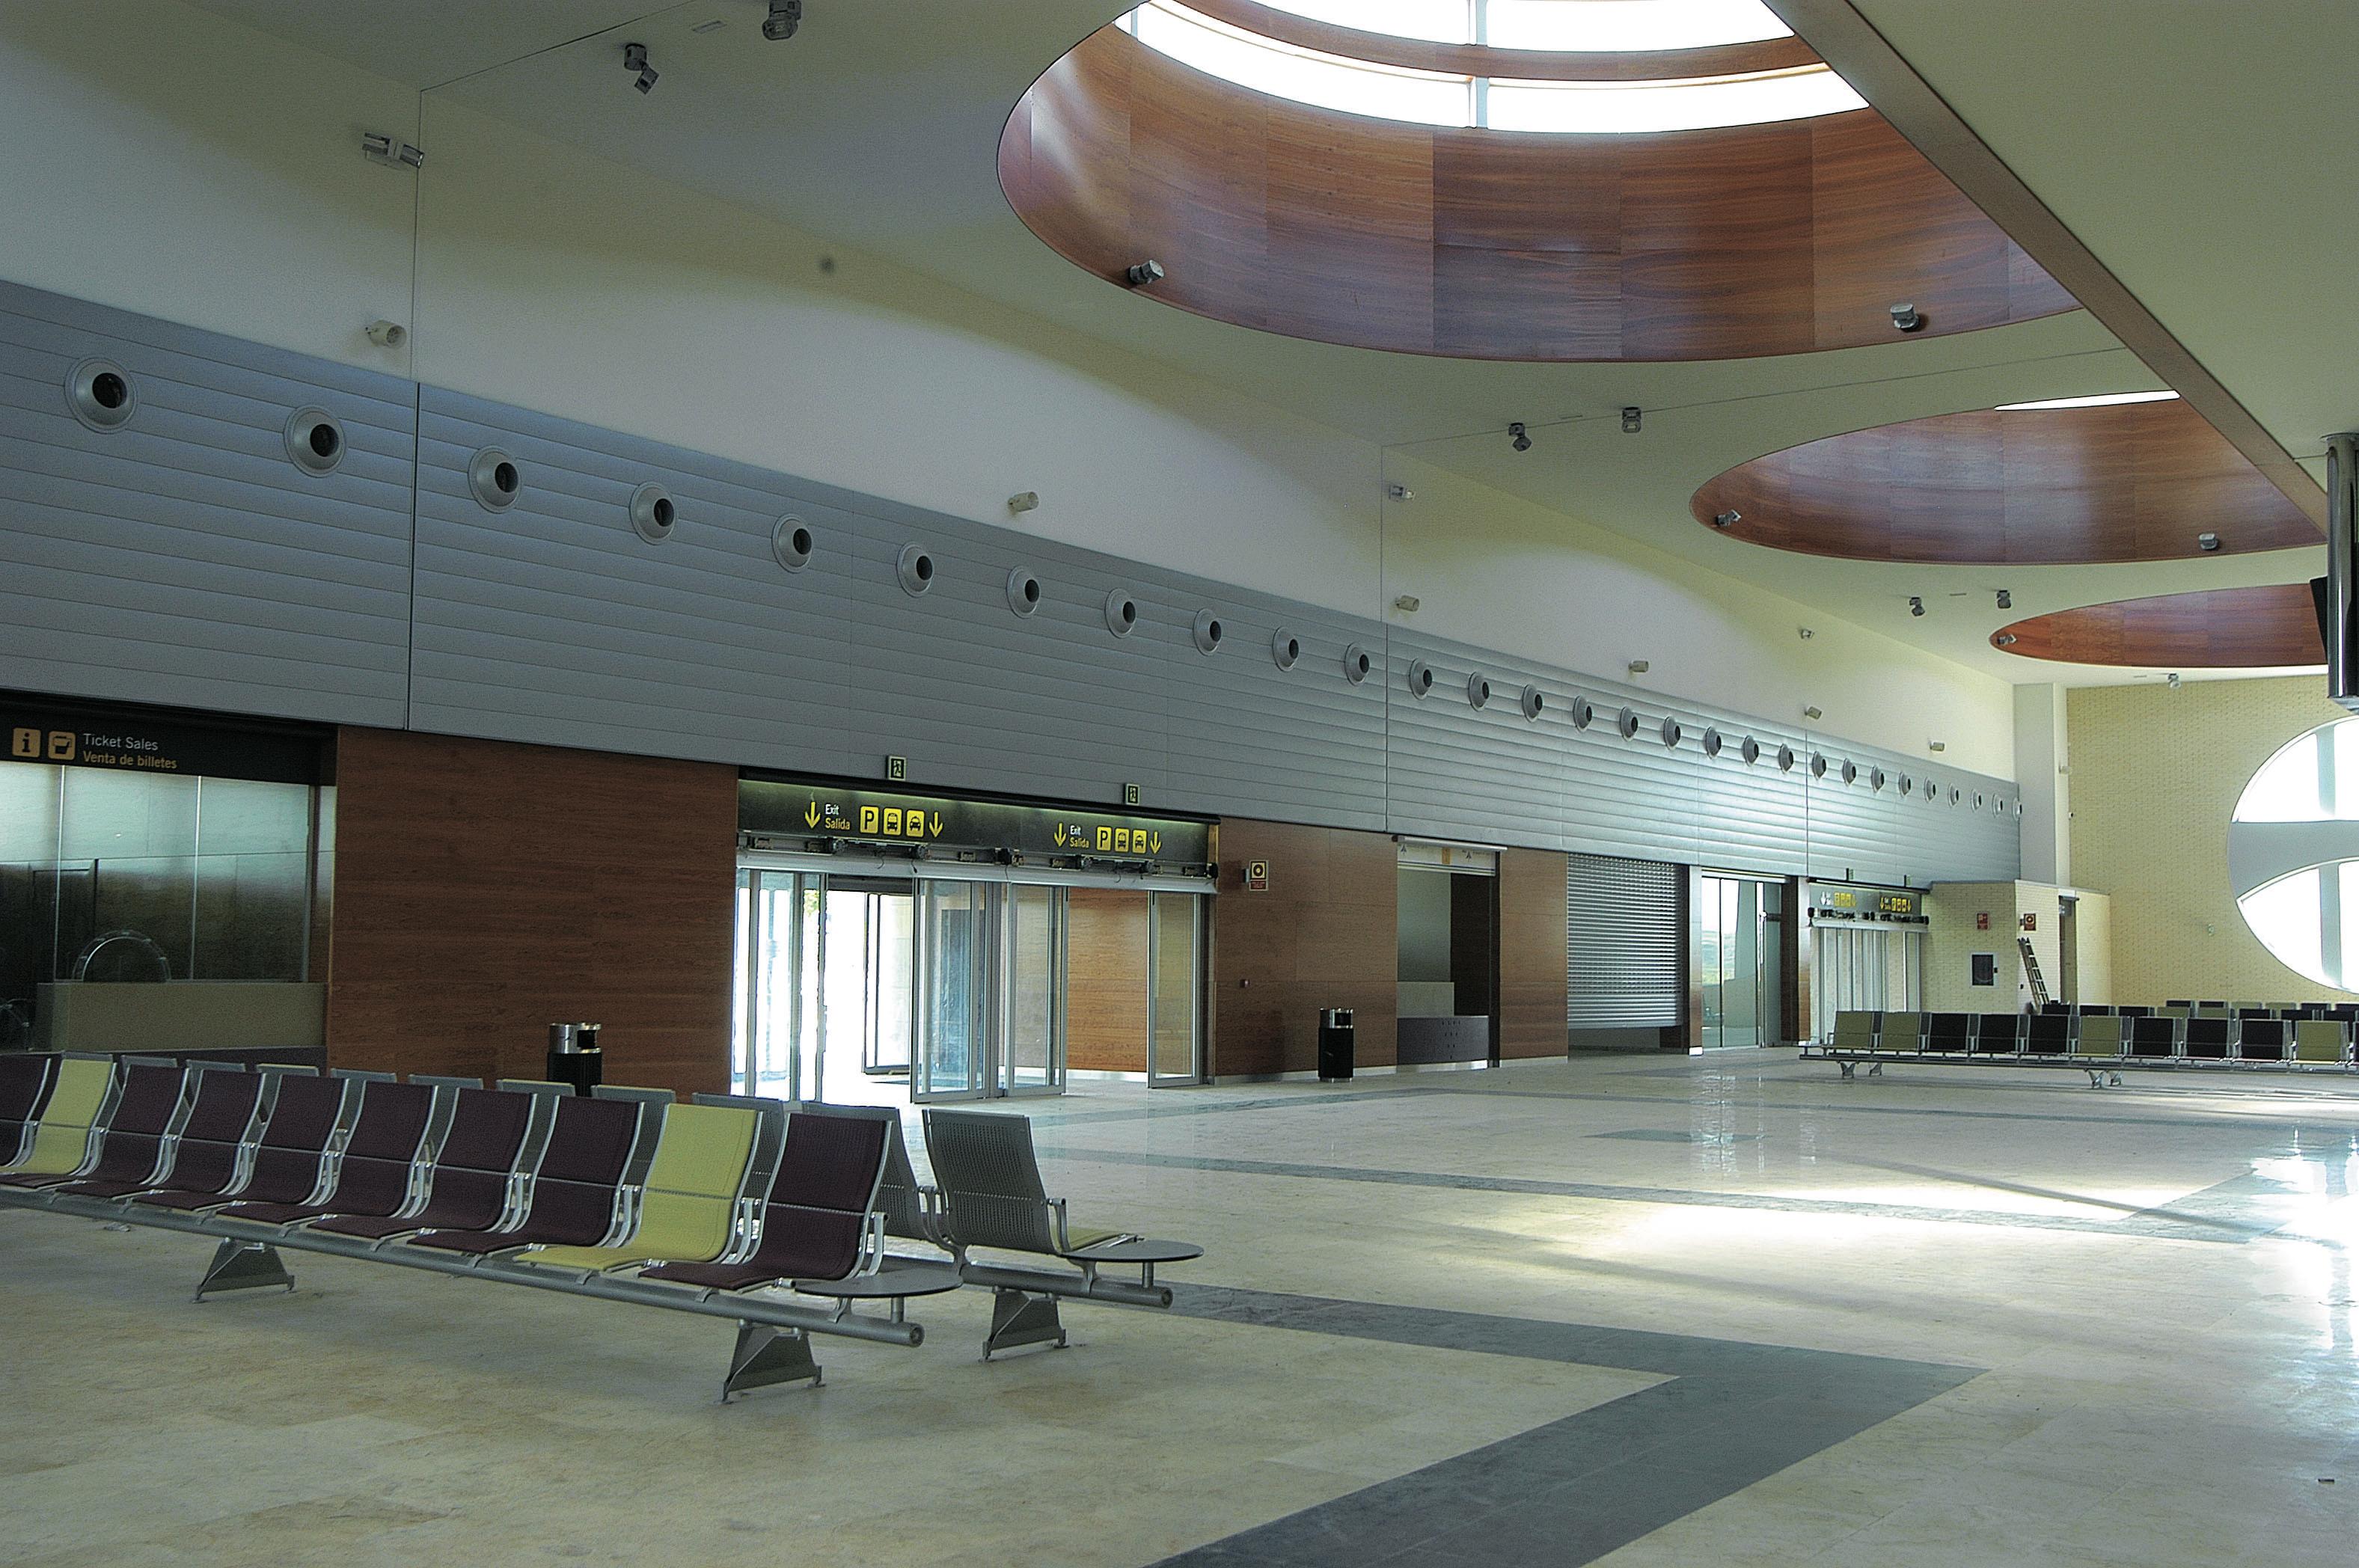 Aeropuerto Logroño interiores vista lateral